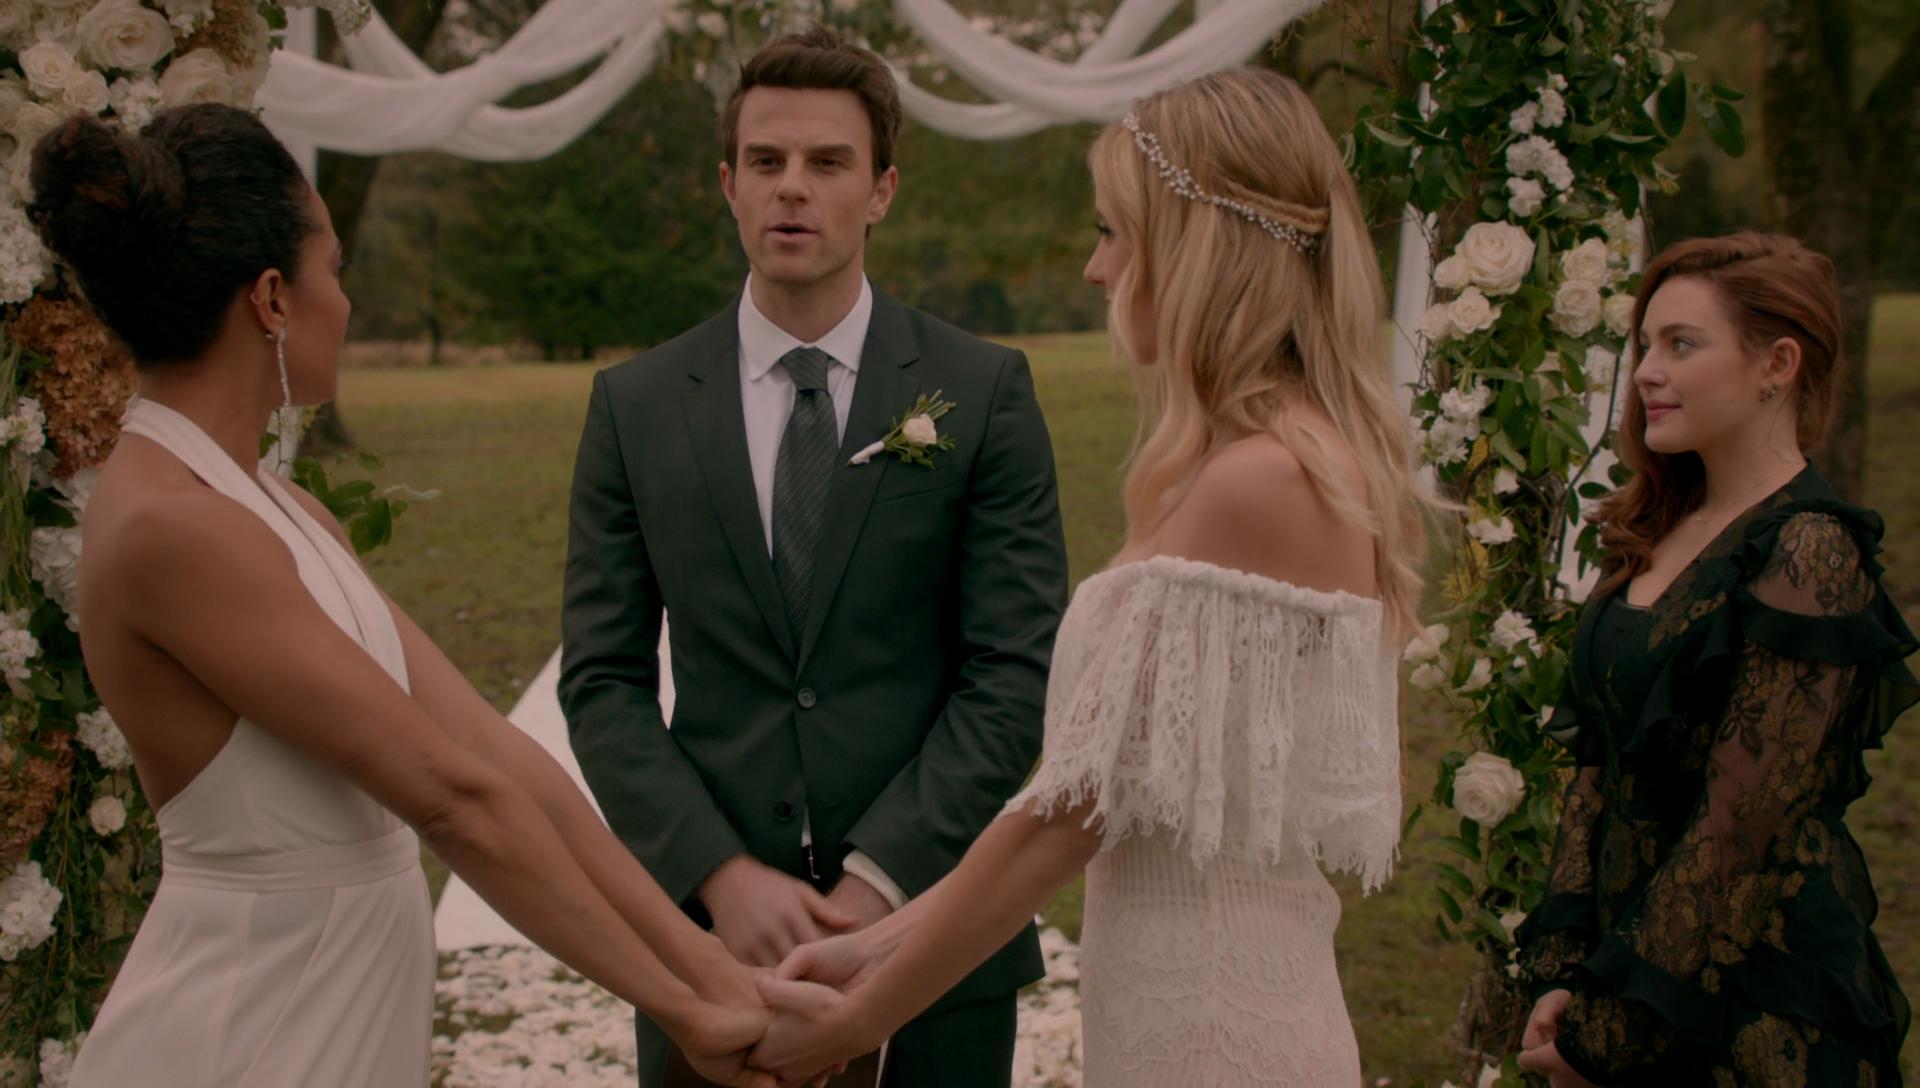 Freya and Keelin's wedding